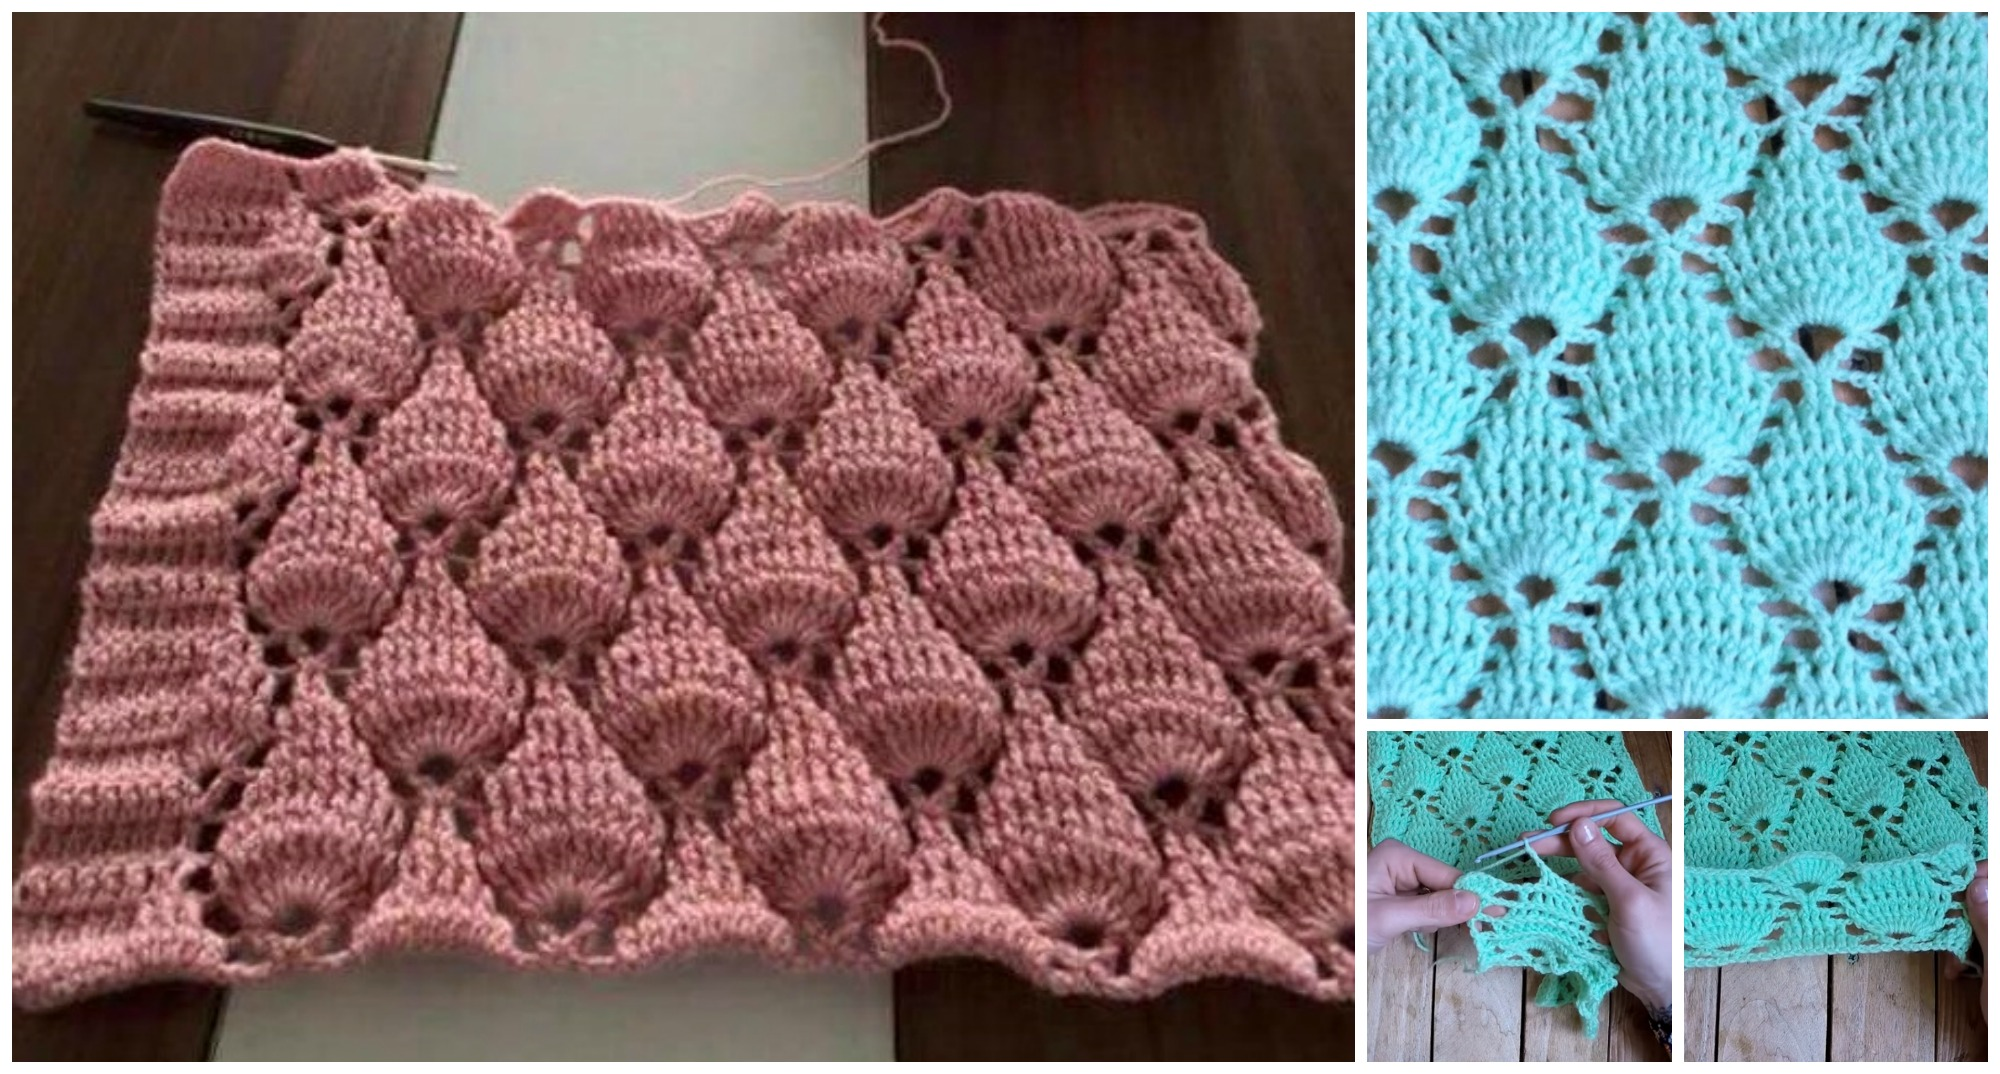 How To Crochet Fantasy Stitch - PRETTY IDEAS